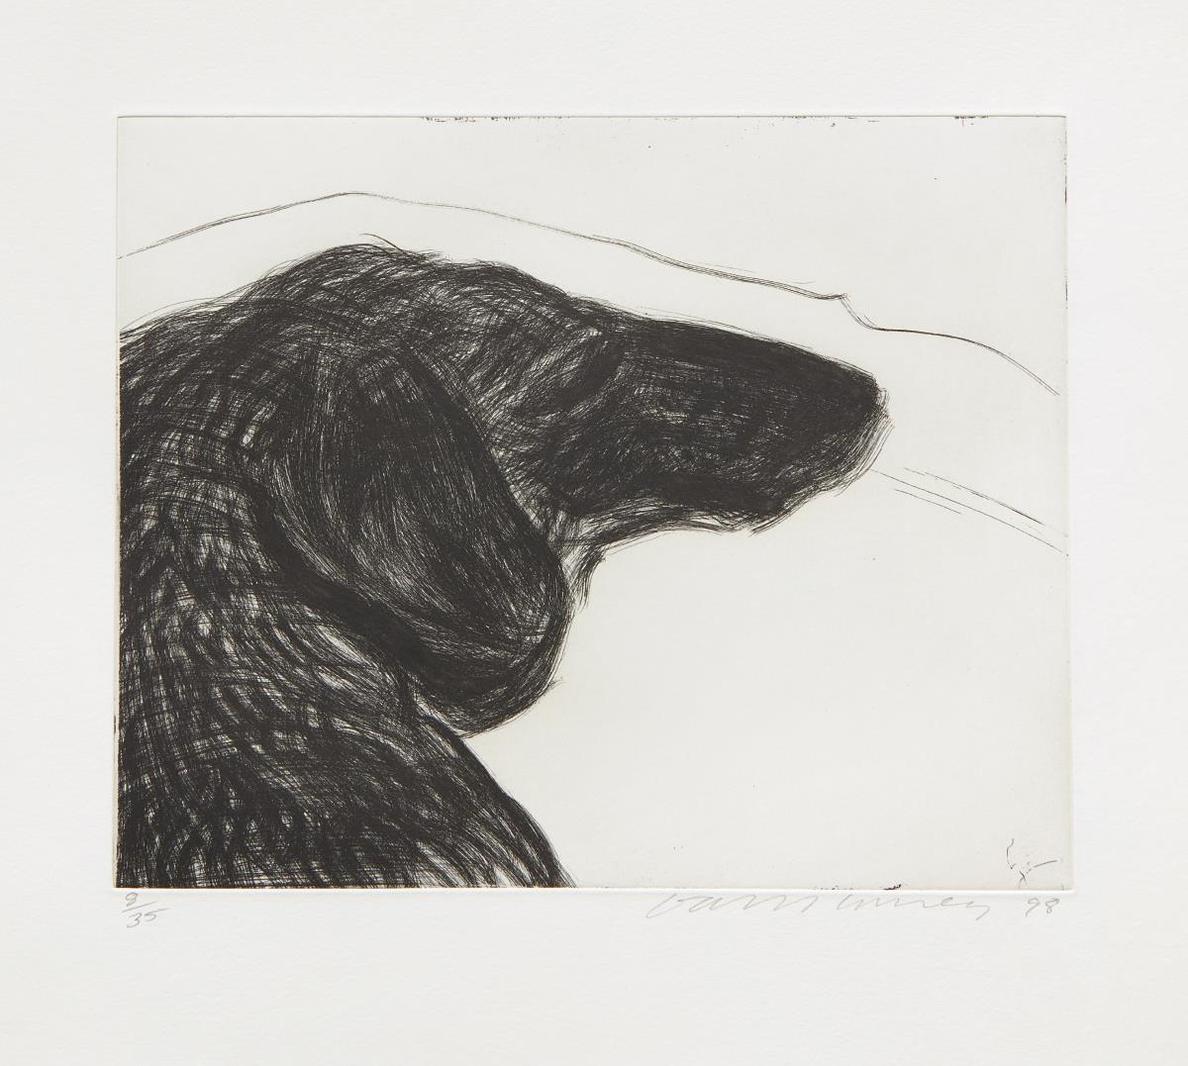 David Hockney-Dog Etching No. 6, From Dog Wall-1994